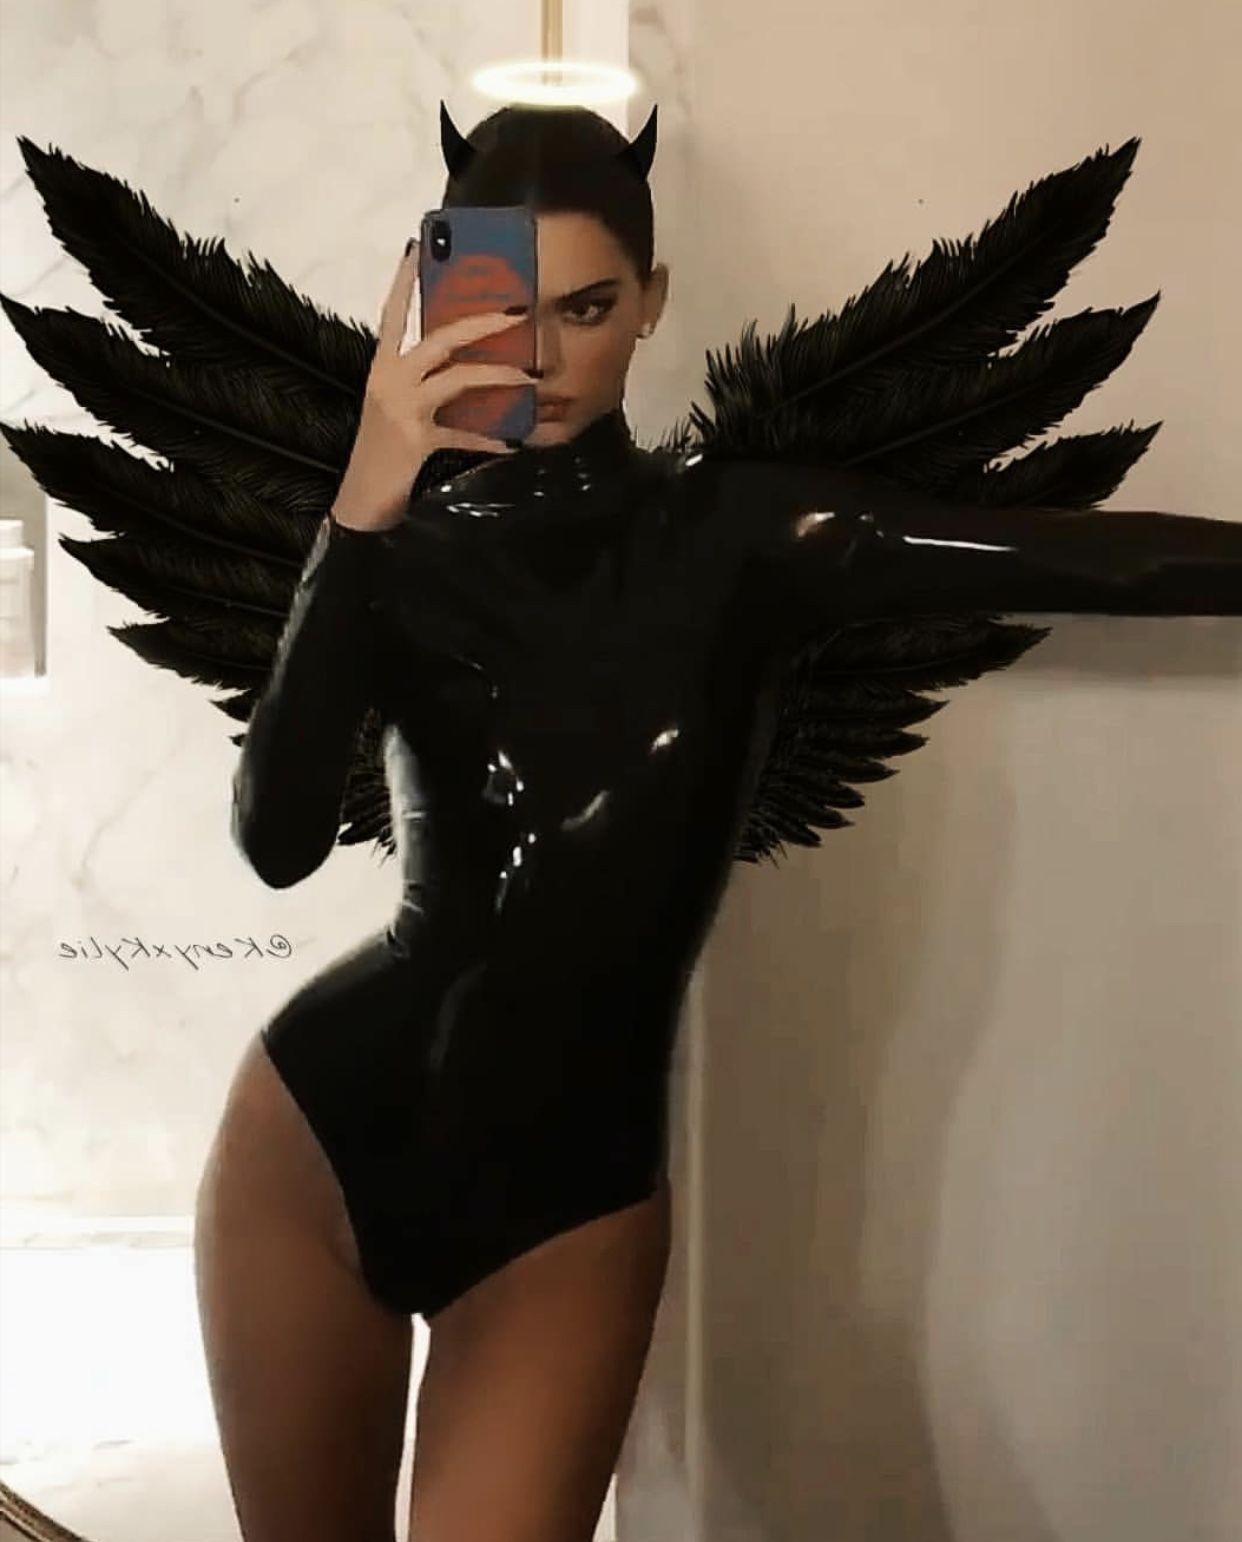 Kendall Jenner Halloween Costume 2020 Kendall Jenner in 2020 | Kendall jenner halloween, Halloween